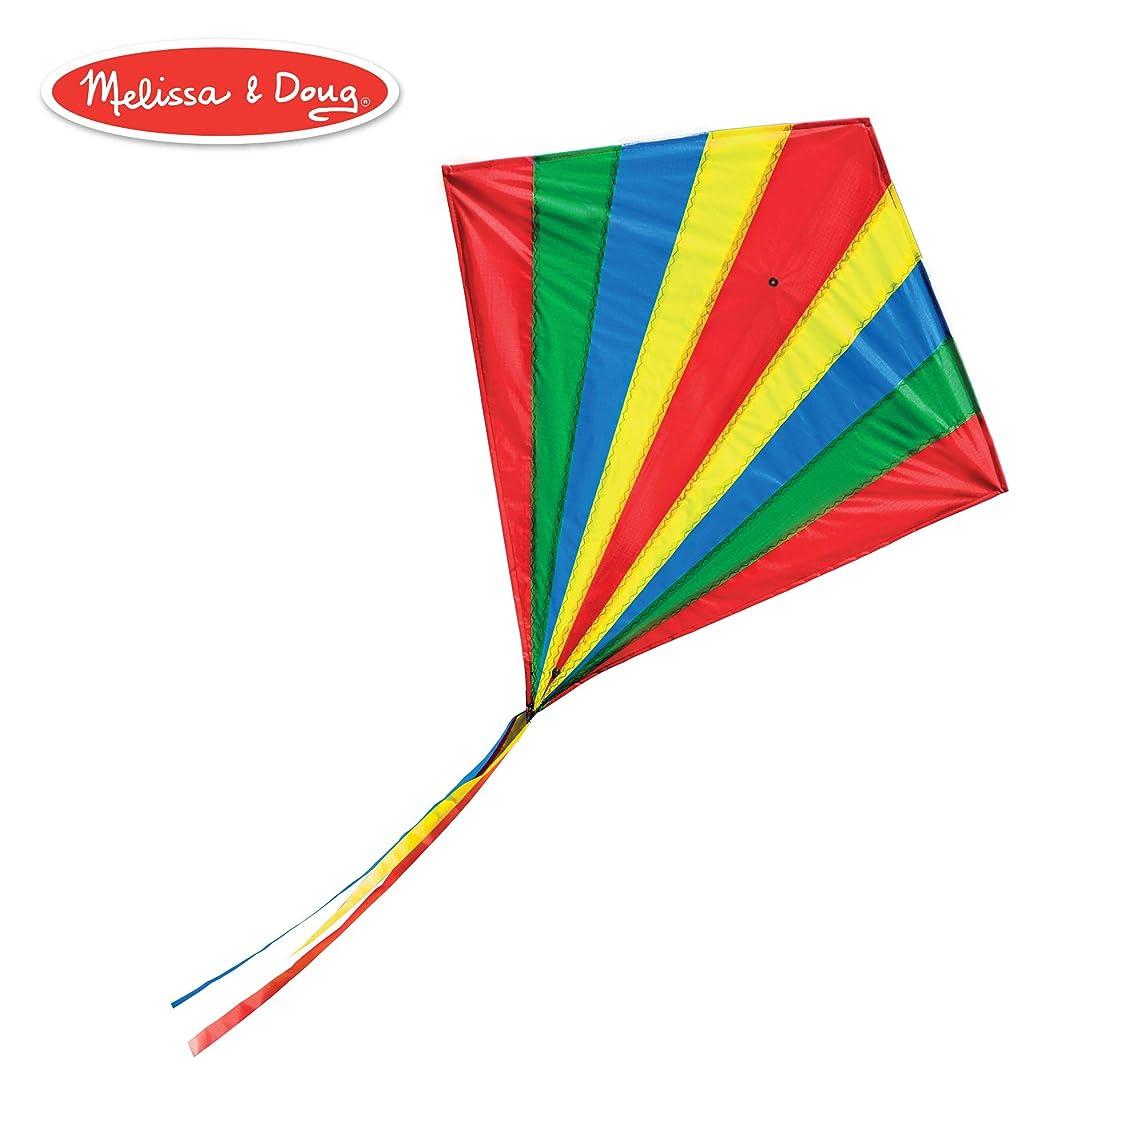 Melissa & Doug Spectrum Diamond Kite Children's Kite